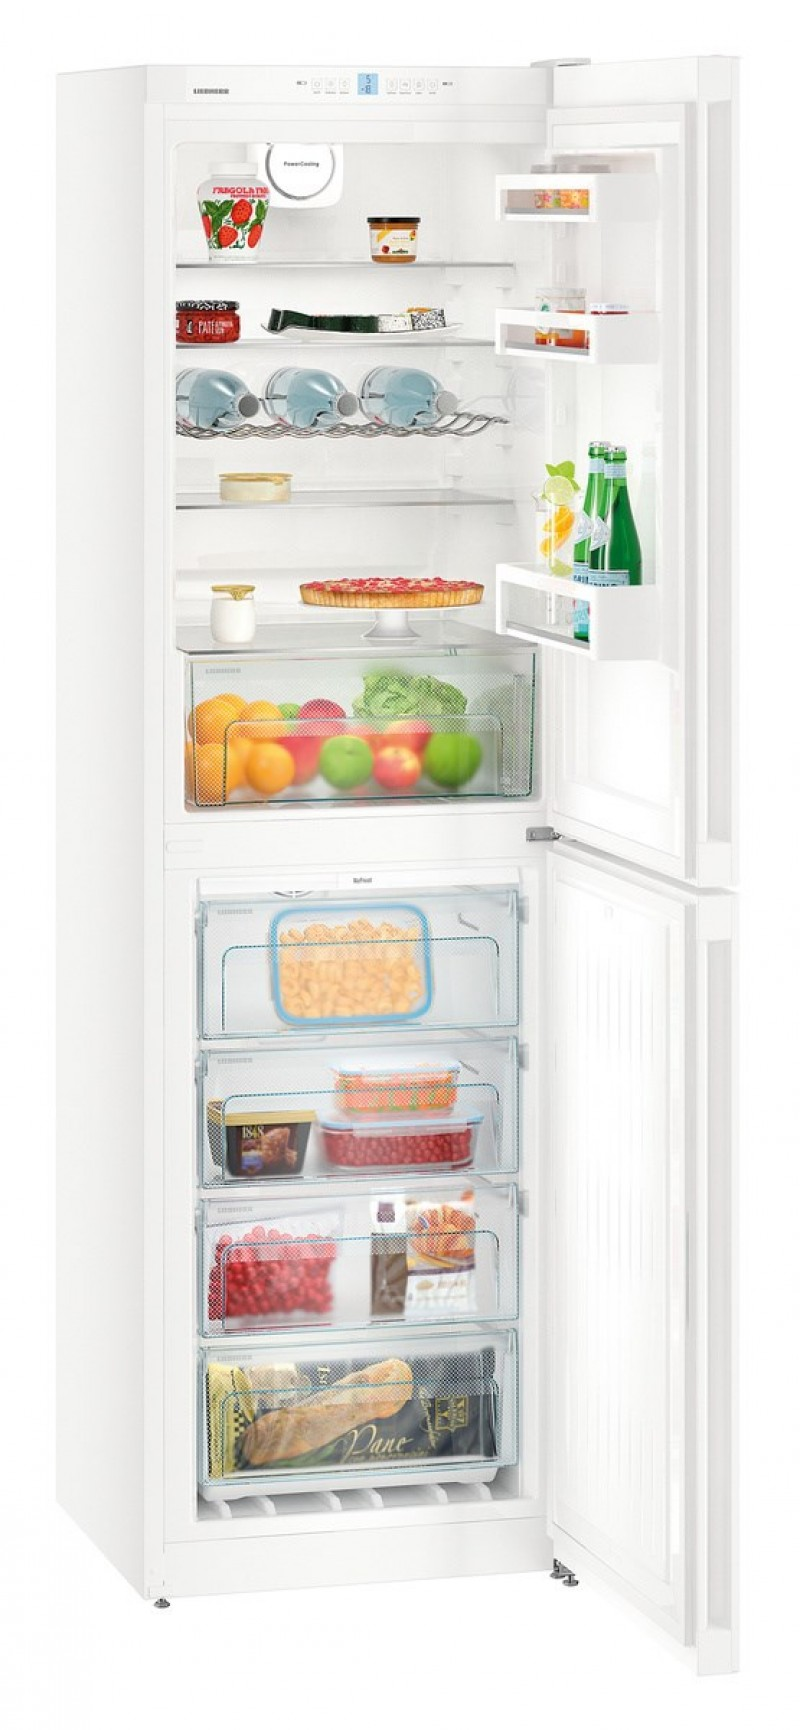 Liebherr CN4713 60cm No Frost Fridge Freezer - 2 Year Warranty